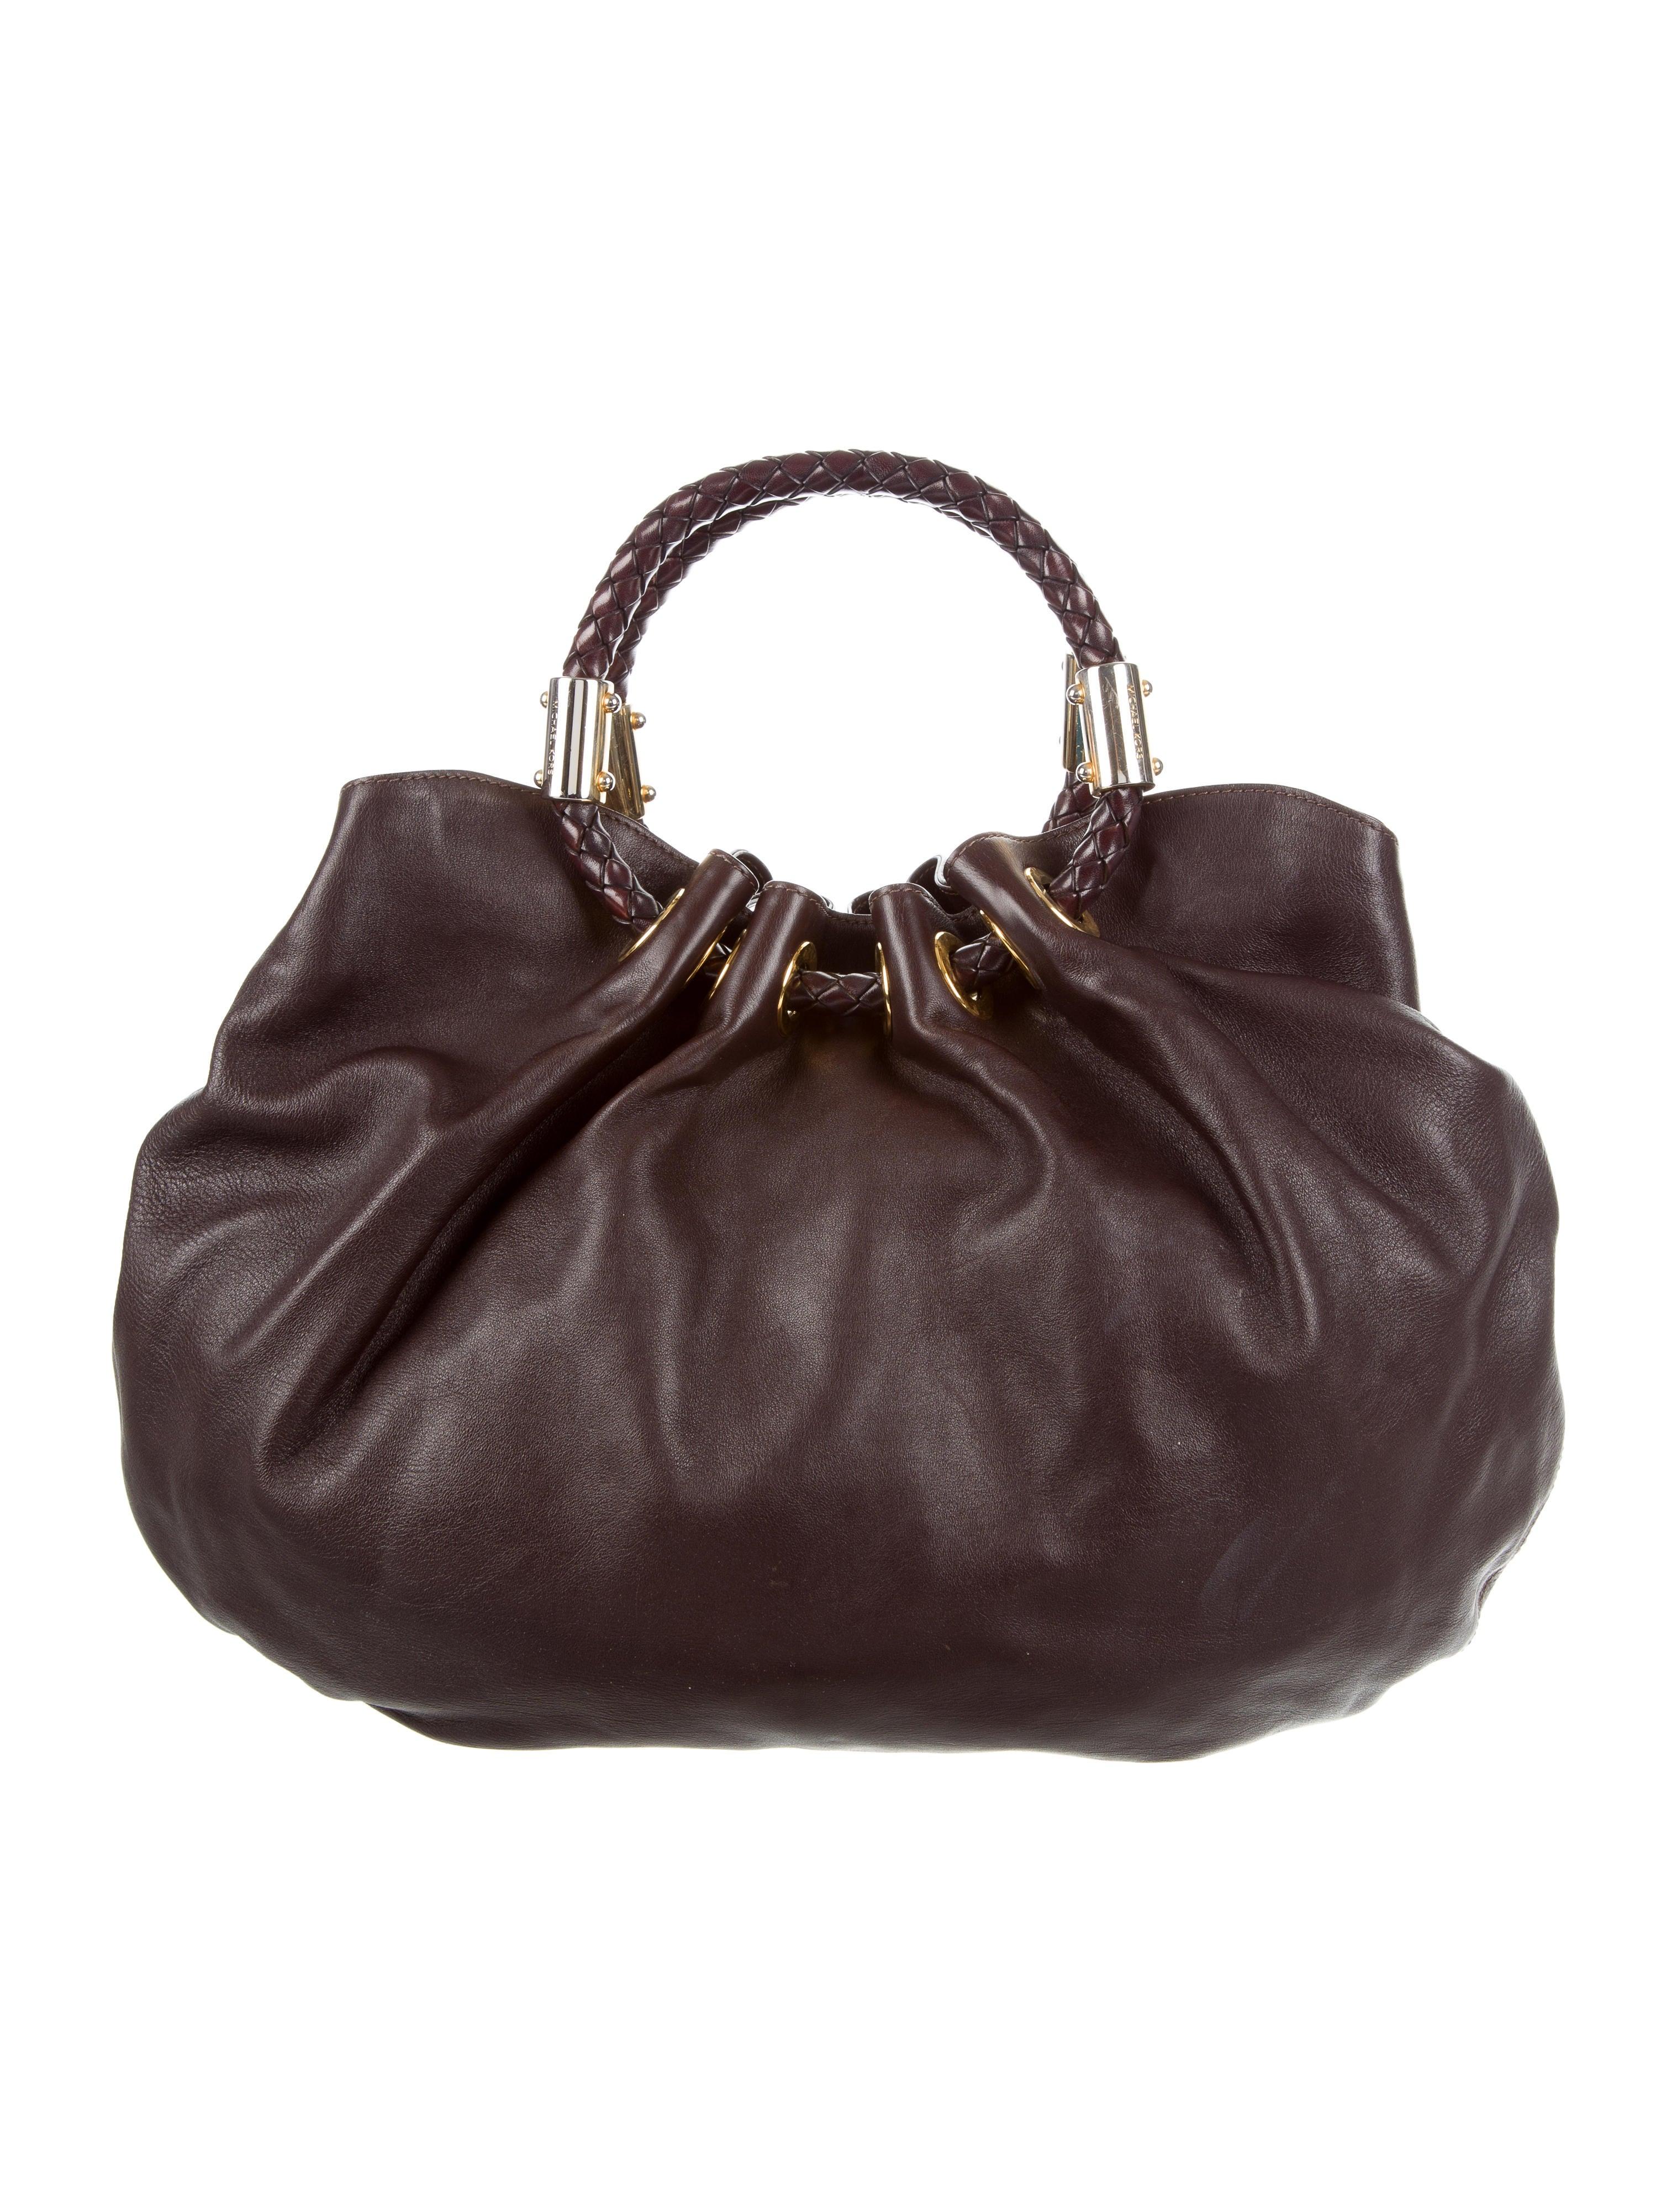 0b83fb0904c4 Michael Kors Skorpios Leather Hobo - Handbags - MIC55464 | The RealReal